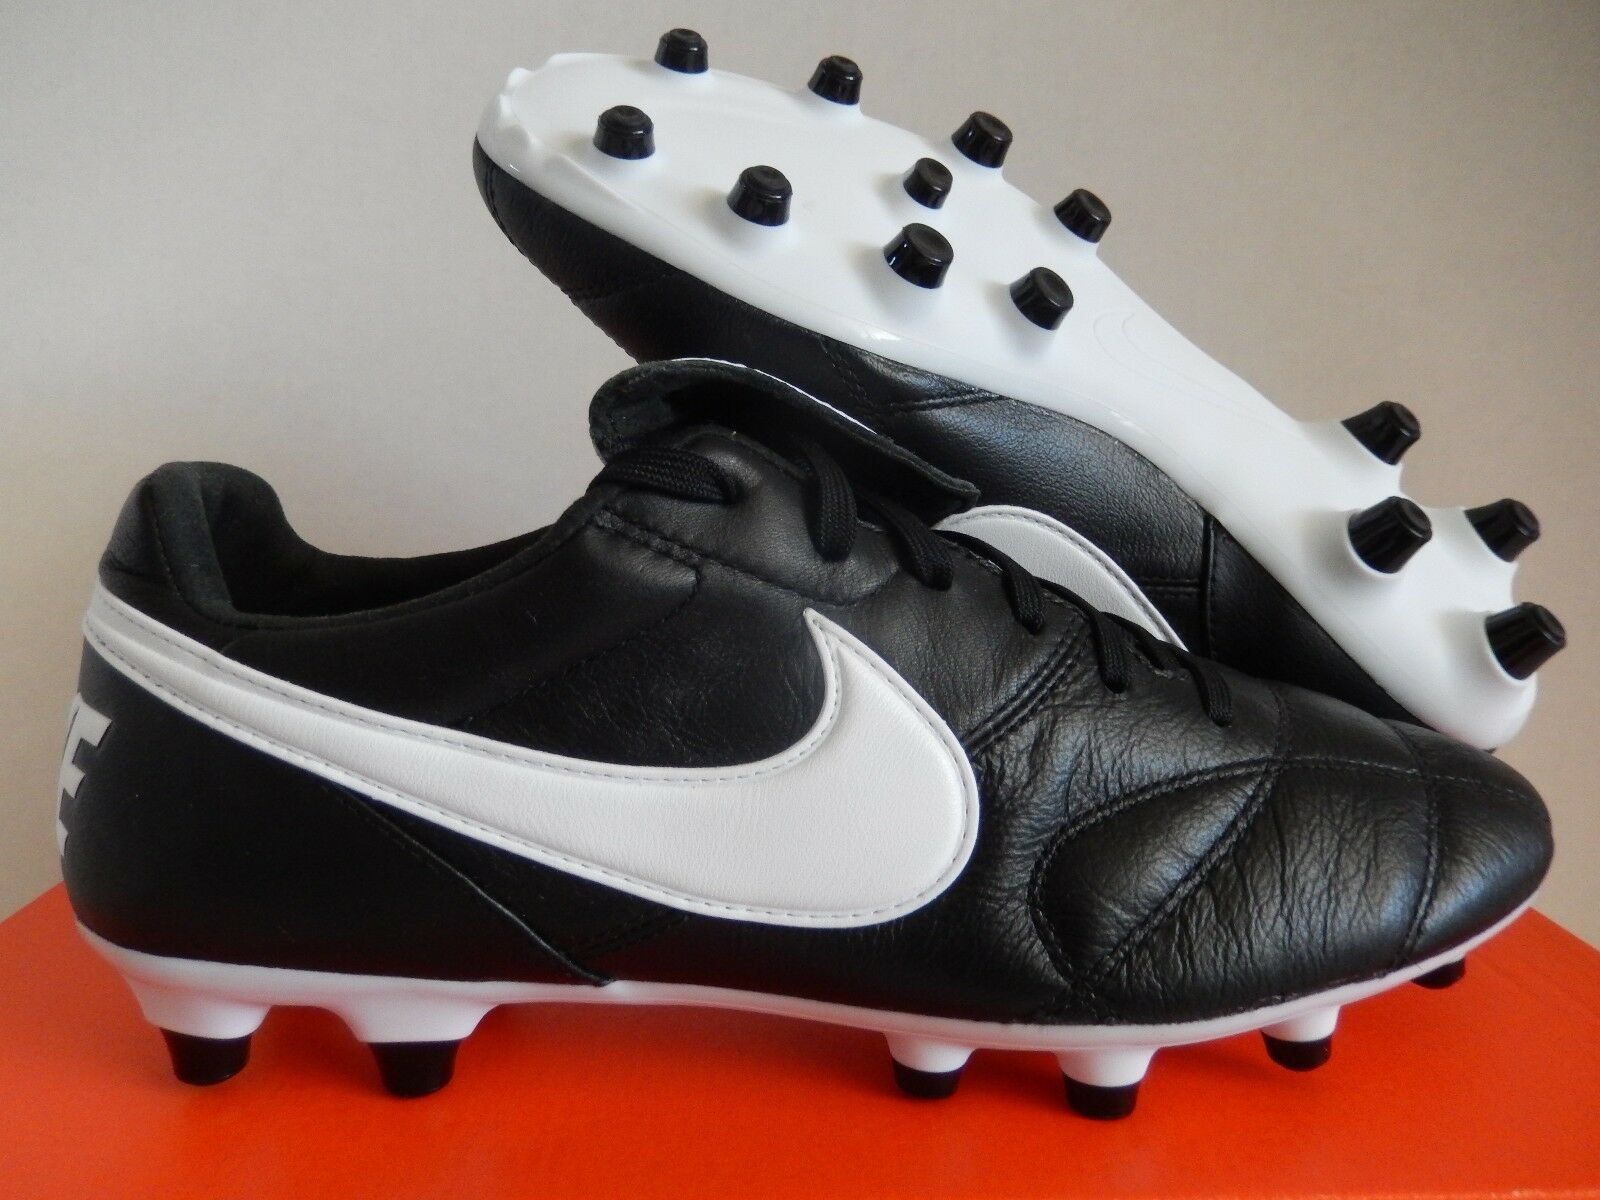 Nike premier ii fg tiempo tiempo tiempo fg känguru / ziegen - leder schwarz-wht sz 6,5 [917803-001] 68afe3